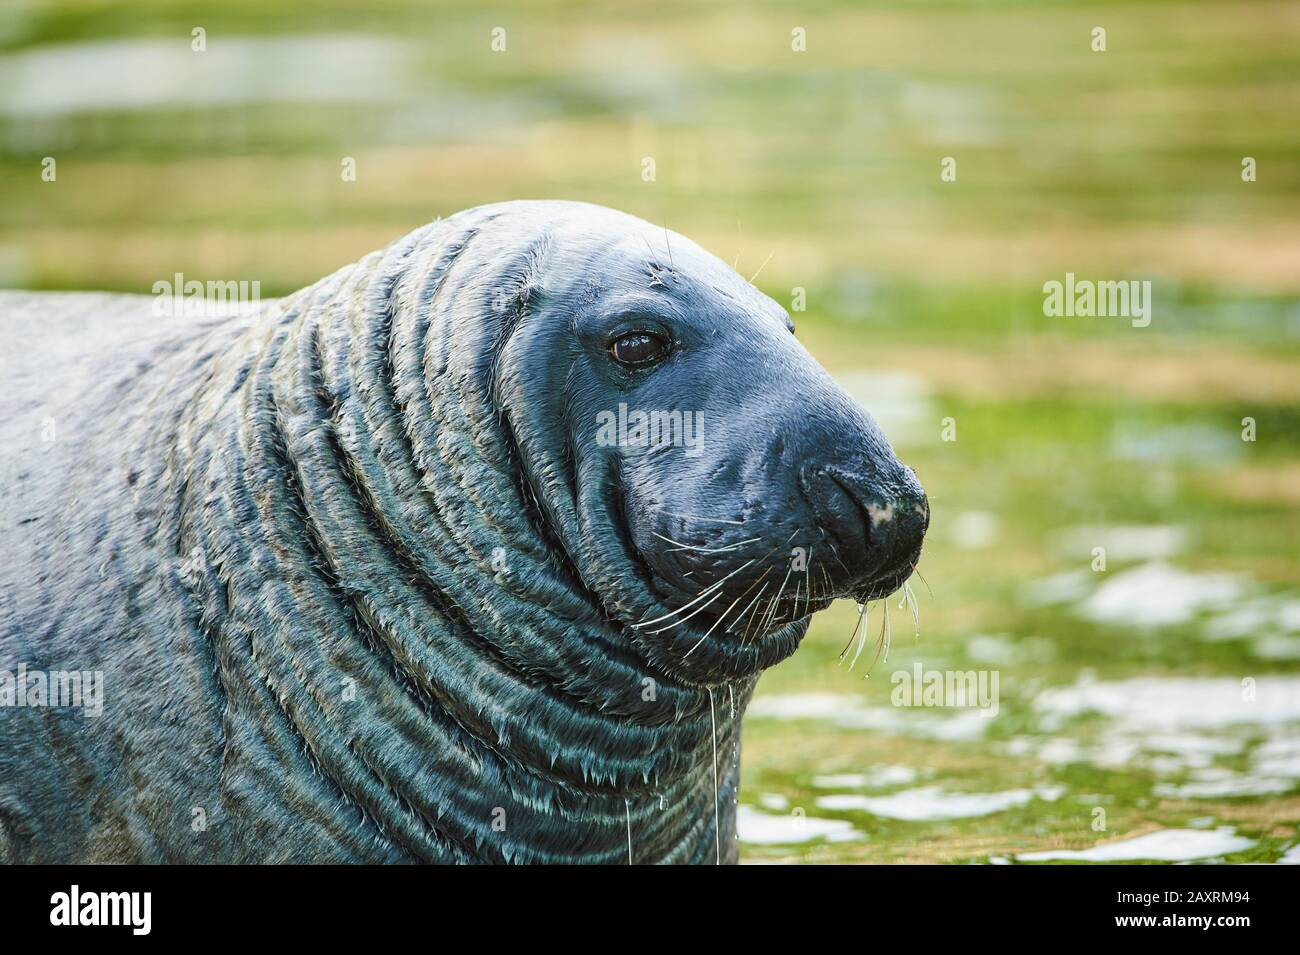 Common seal, Phoca vitulina, water, portrait, sideways Stock Photo